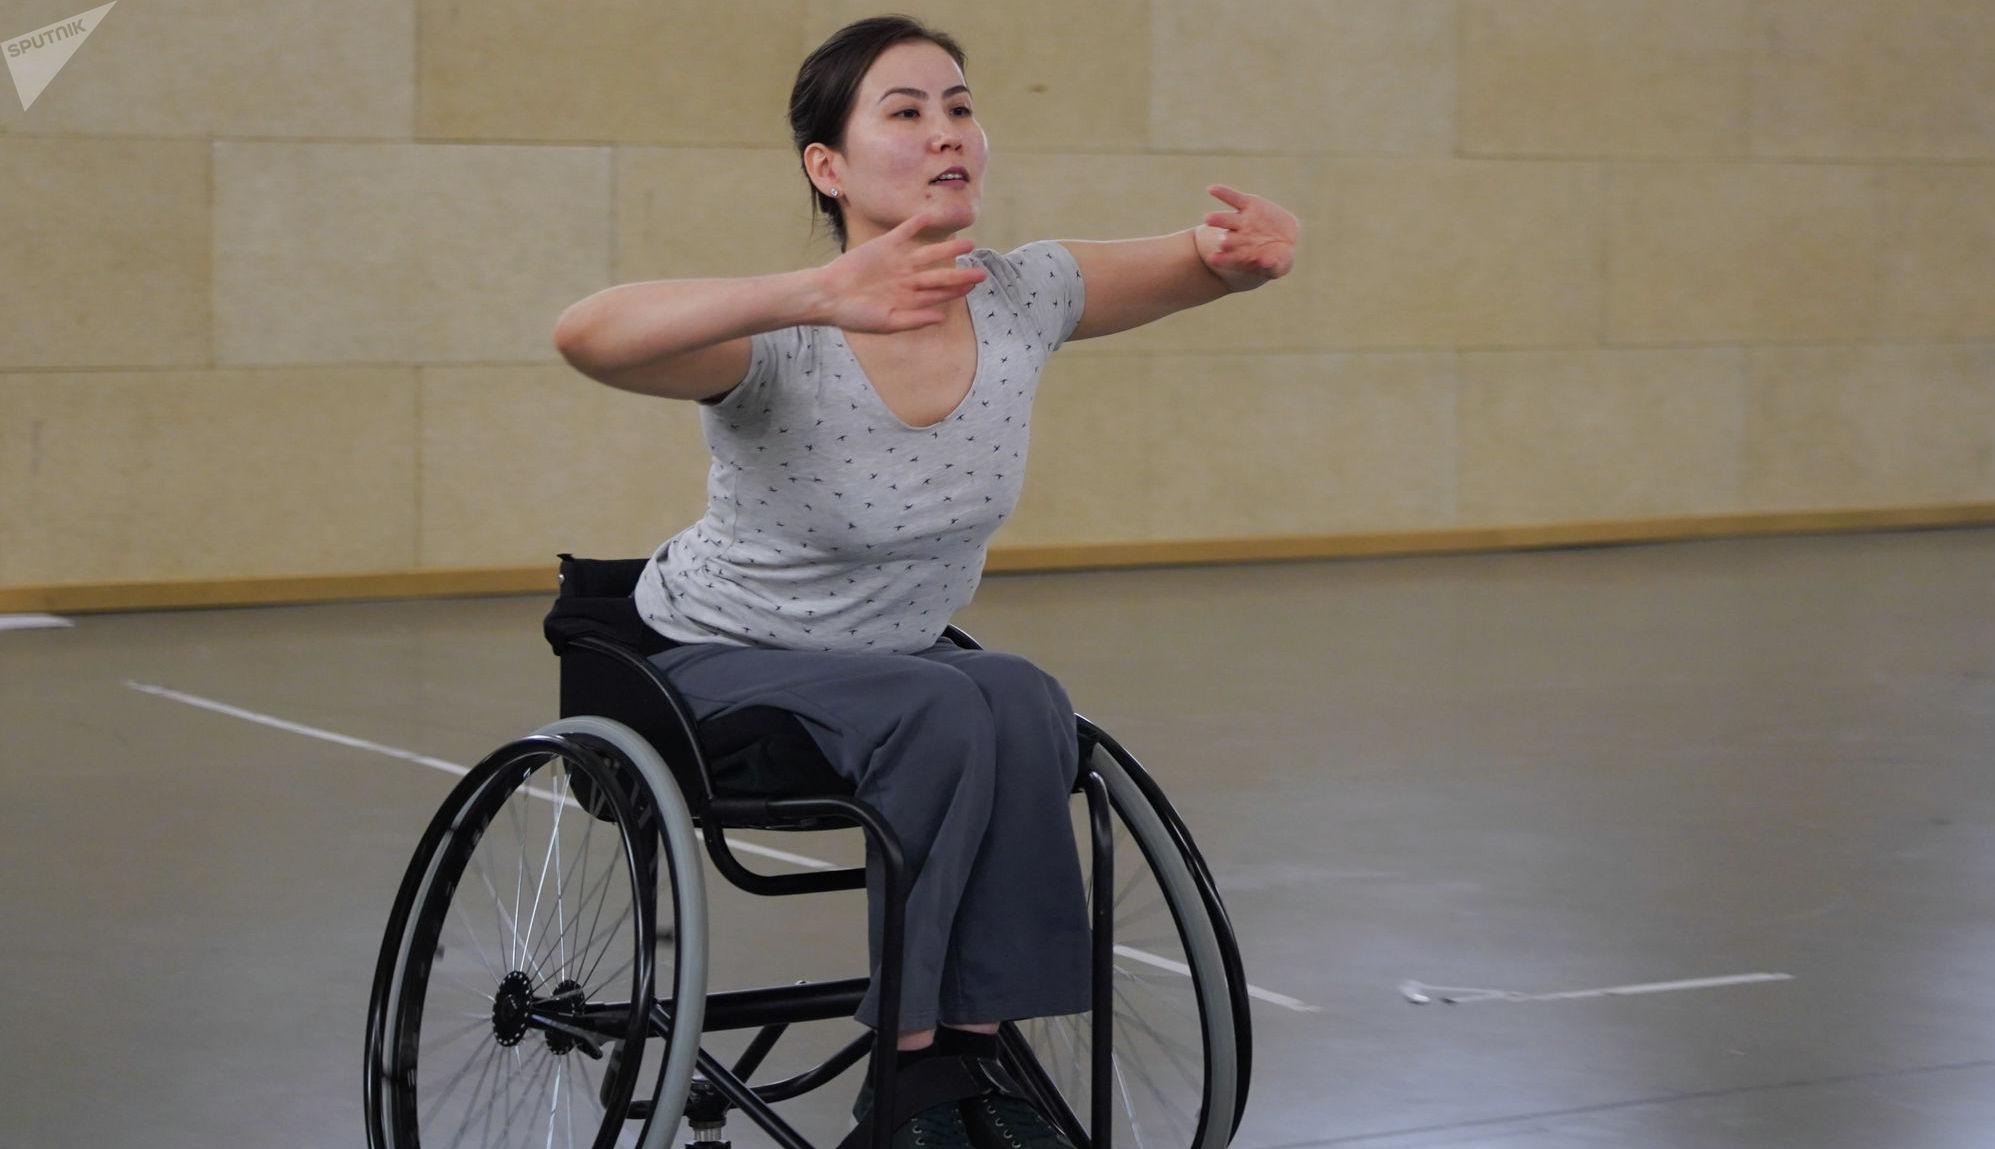 Чемпионка мира по паратанцам (спортивные танцы на колясках) Карлыгаш Тынабекова